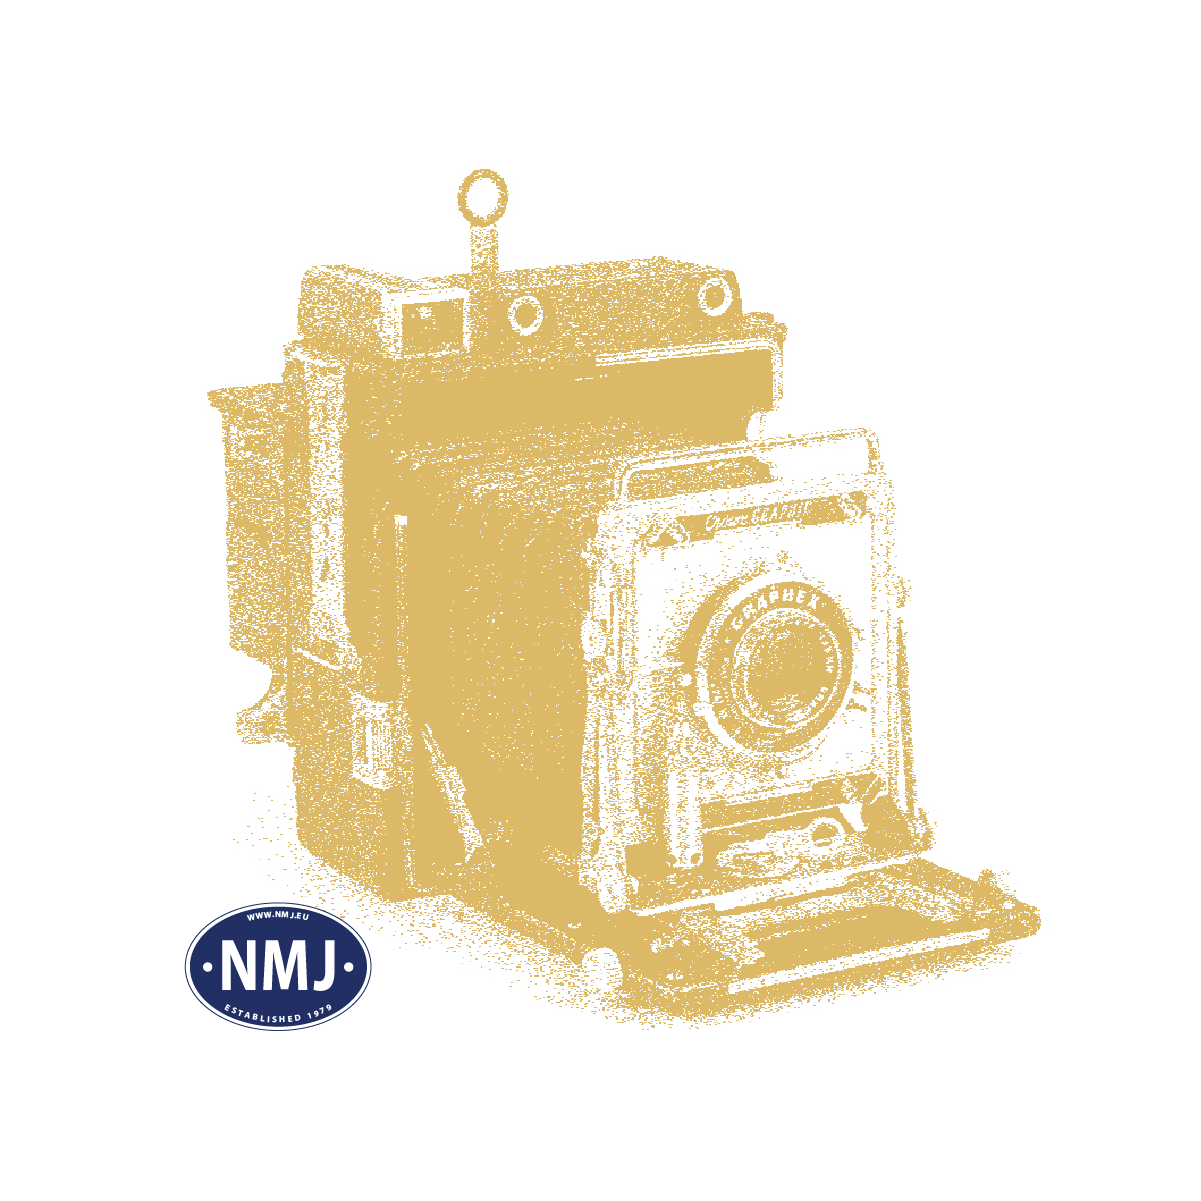 NOC15873 - Turgåere